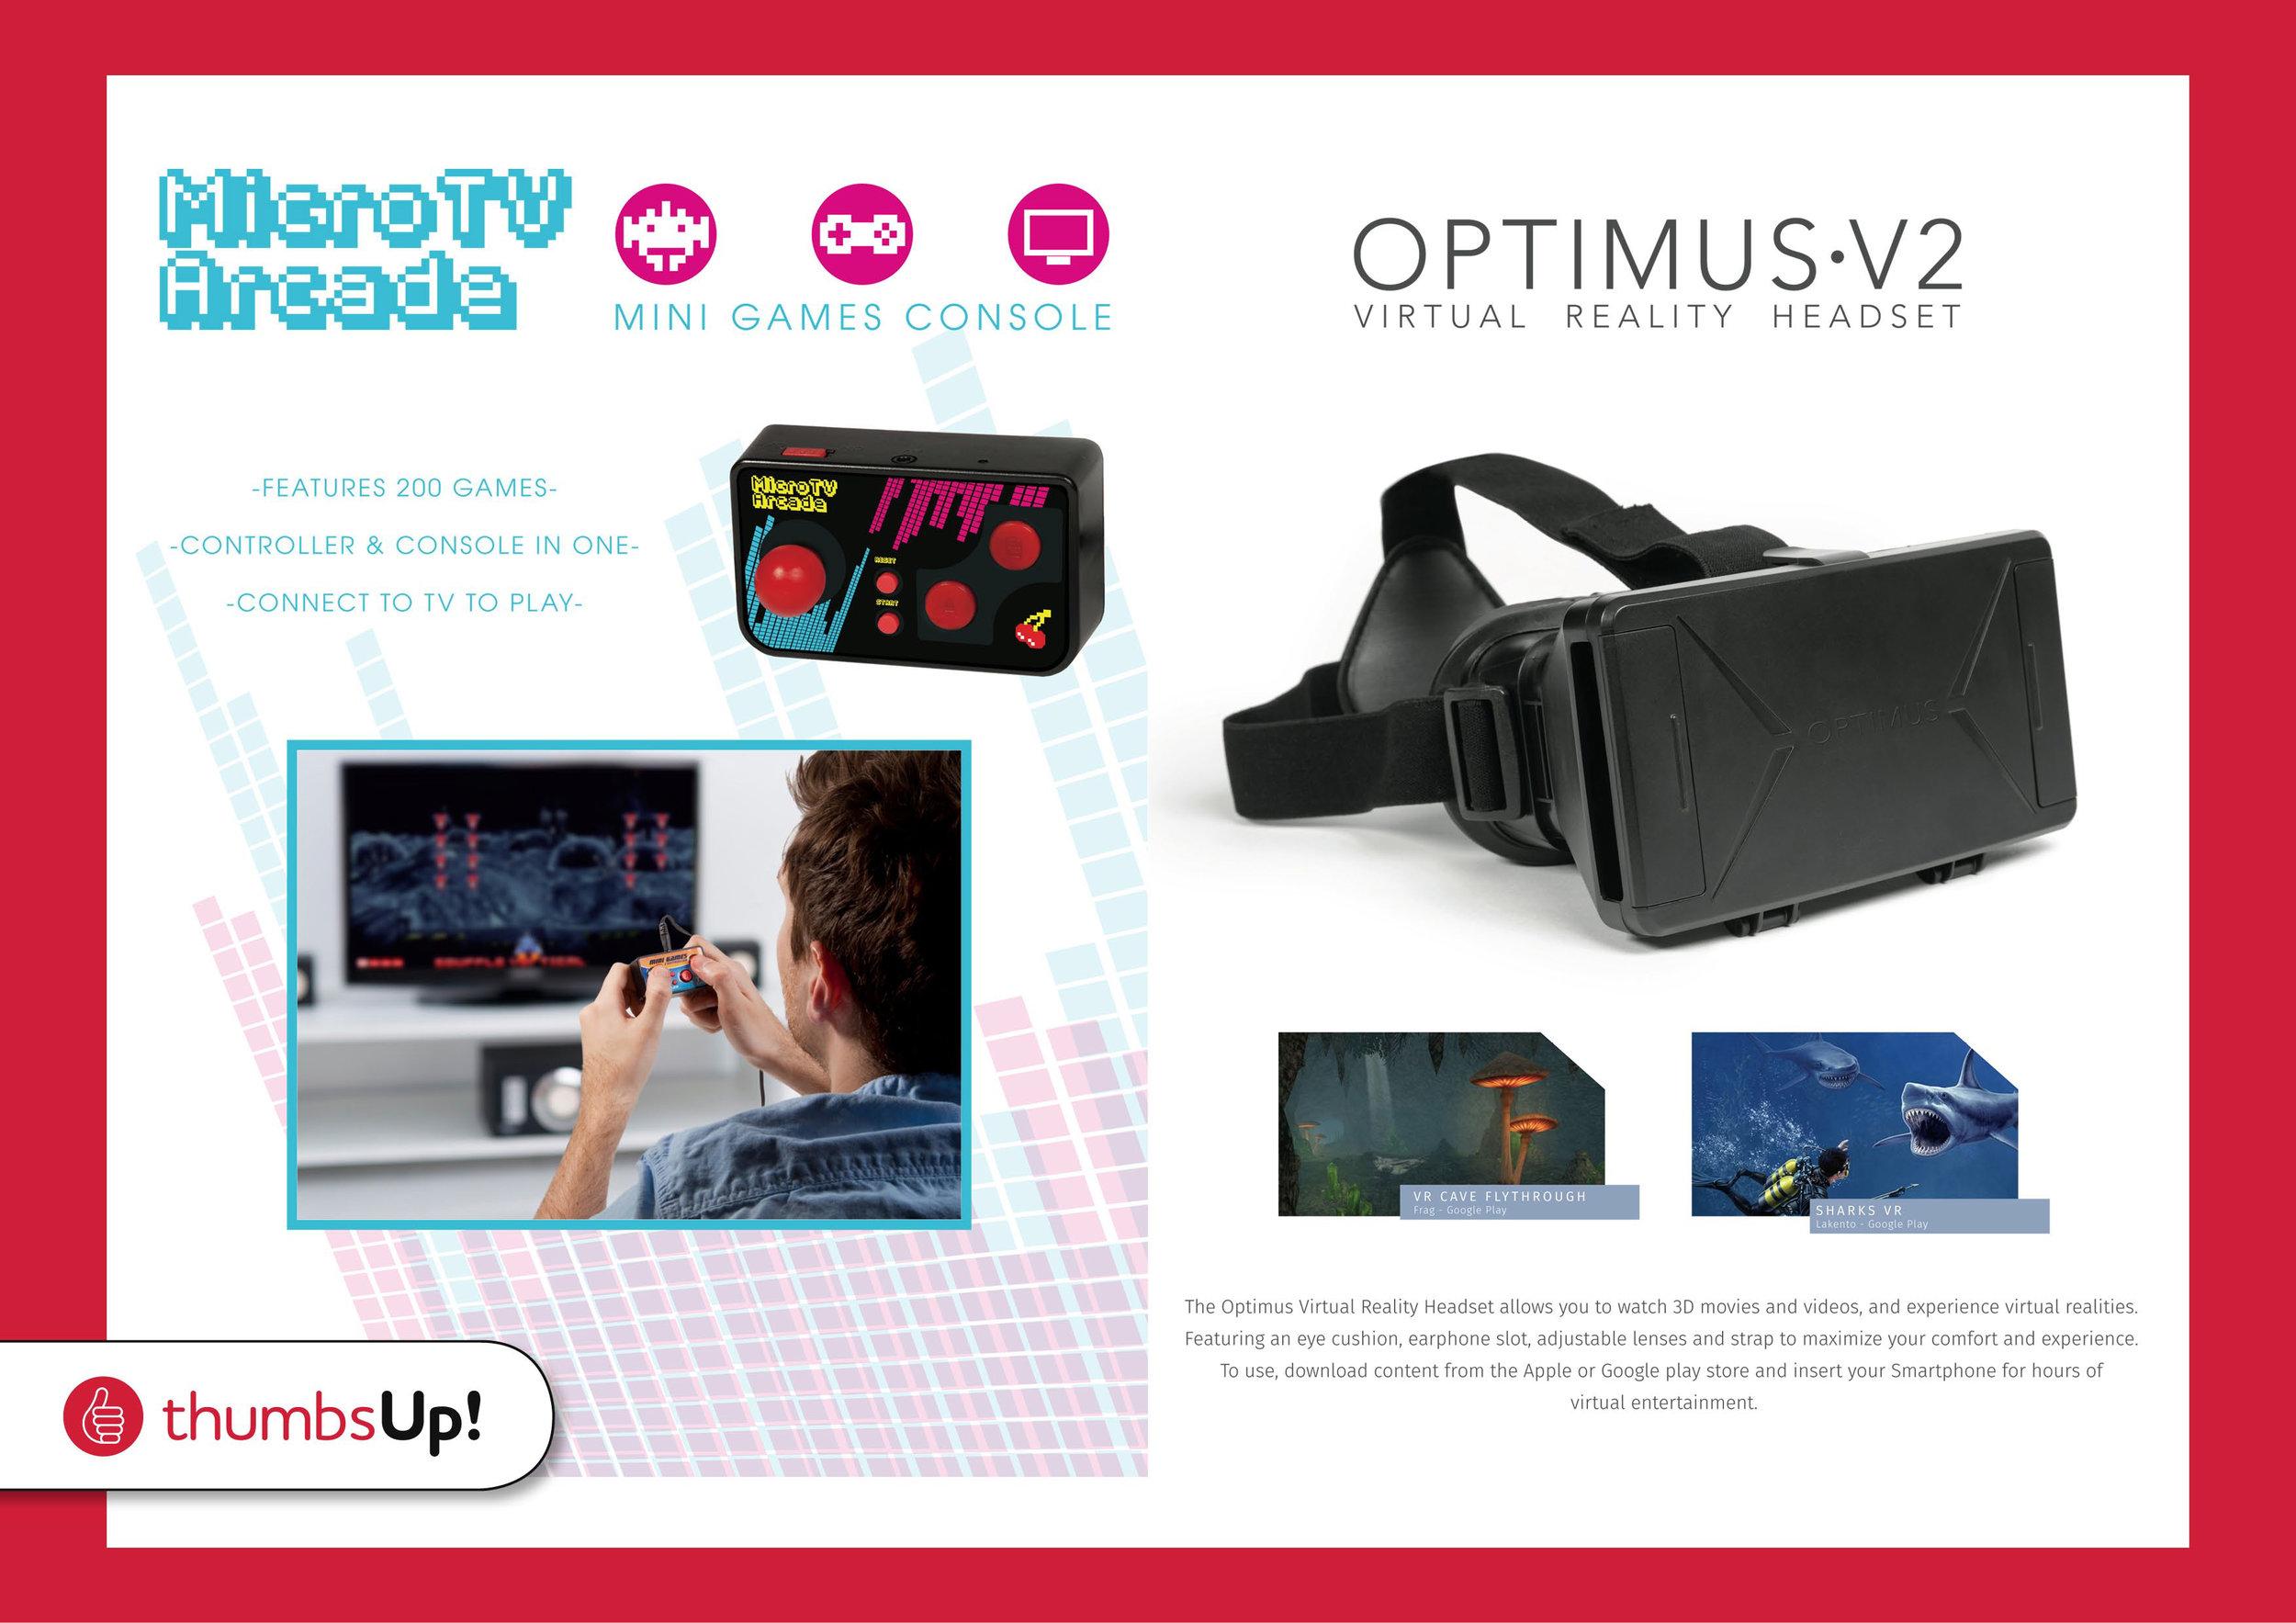 thumbs-up-electronics-microtv-arcada-optimus-v2_scorpio-worldwide_travel-retail-distributor